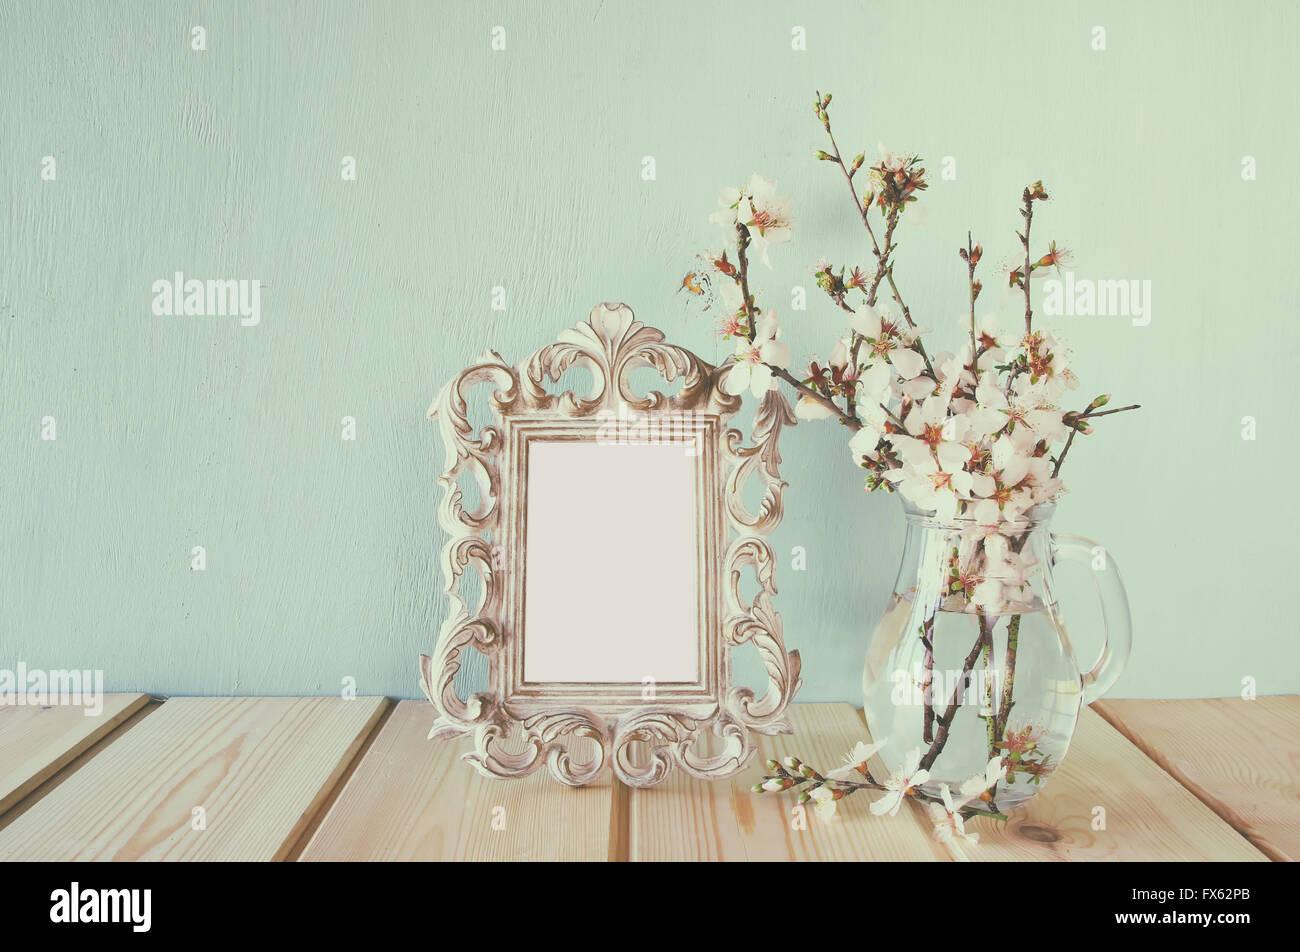 Vintage-leere Rahmen neben weißen Frühlingsblumen. selektiven Fokus ...